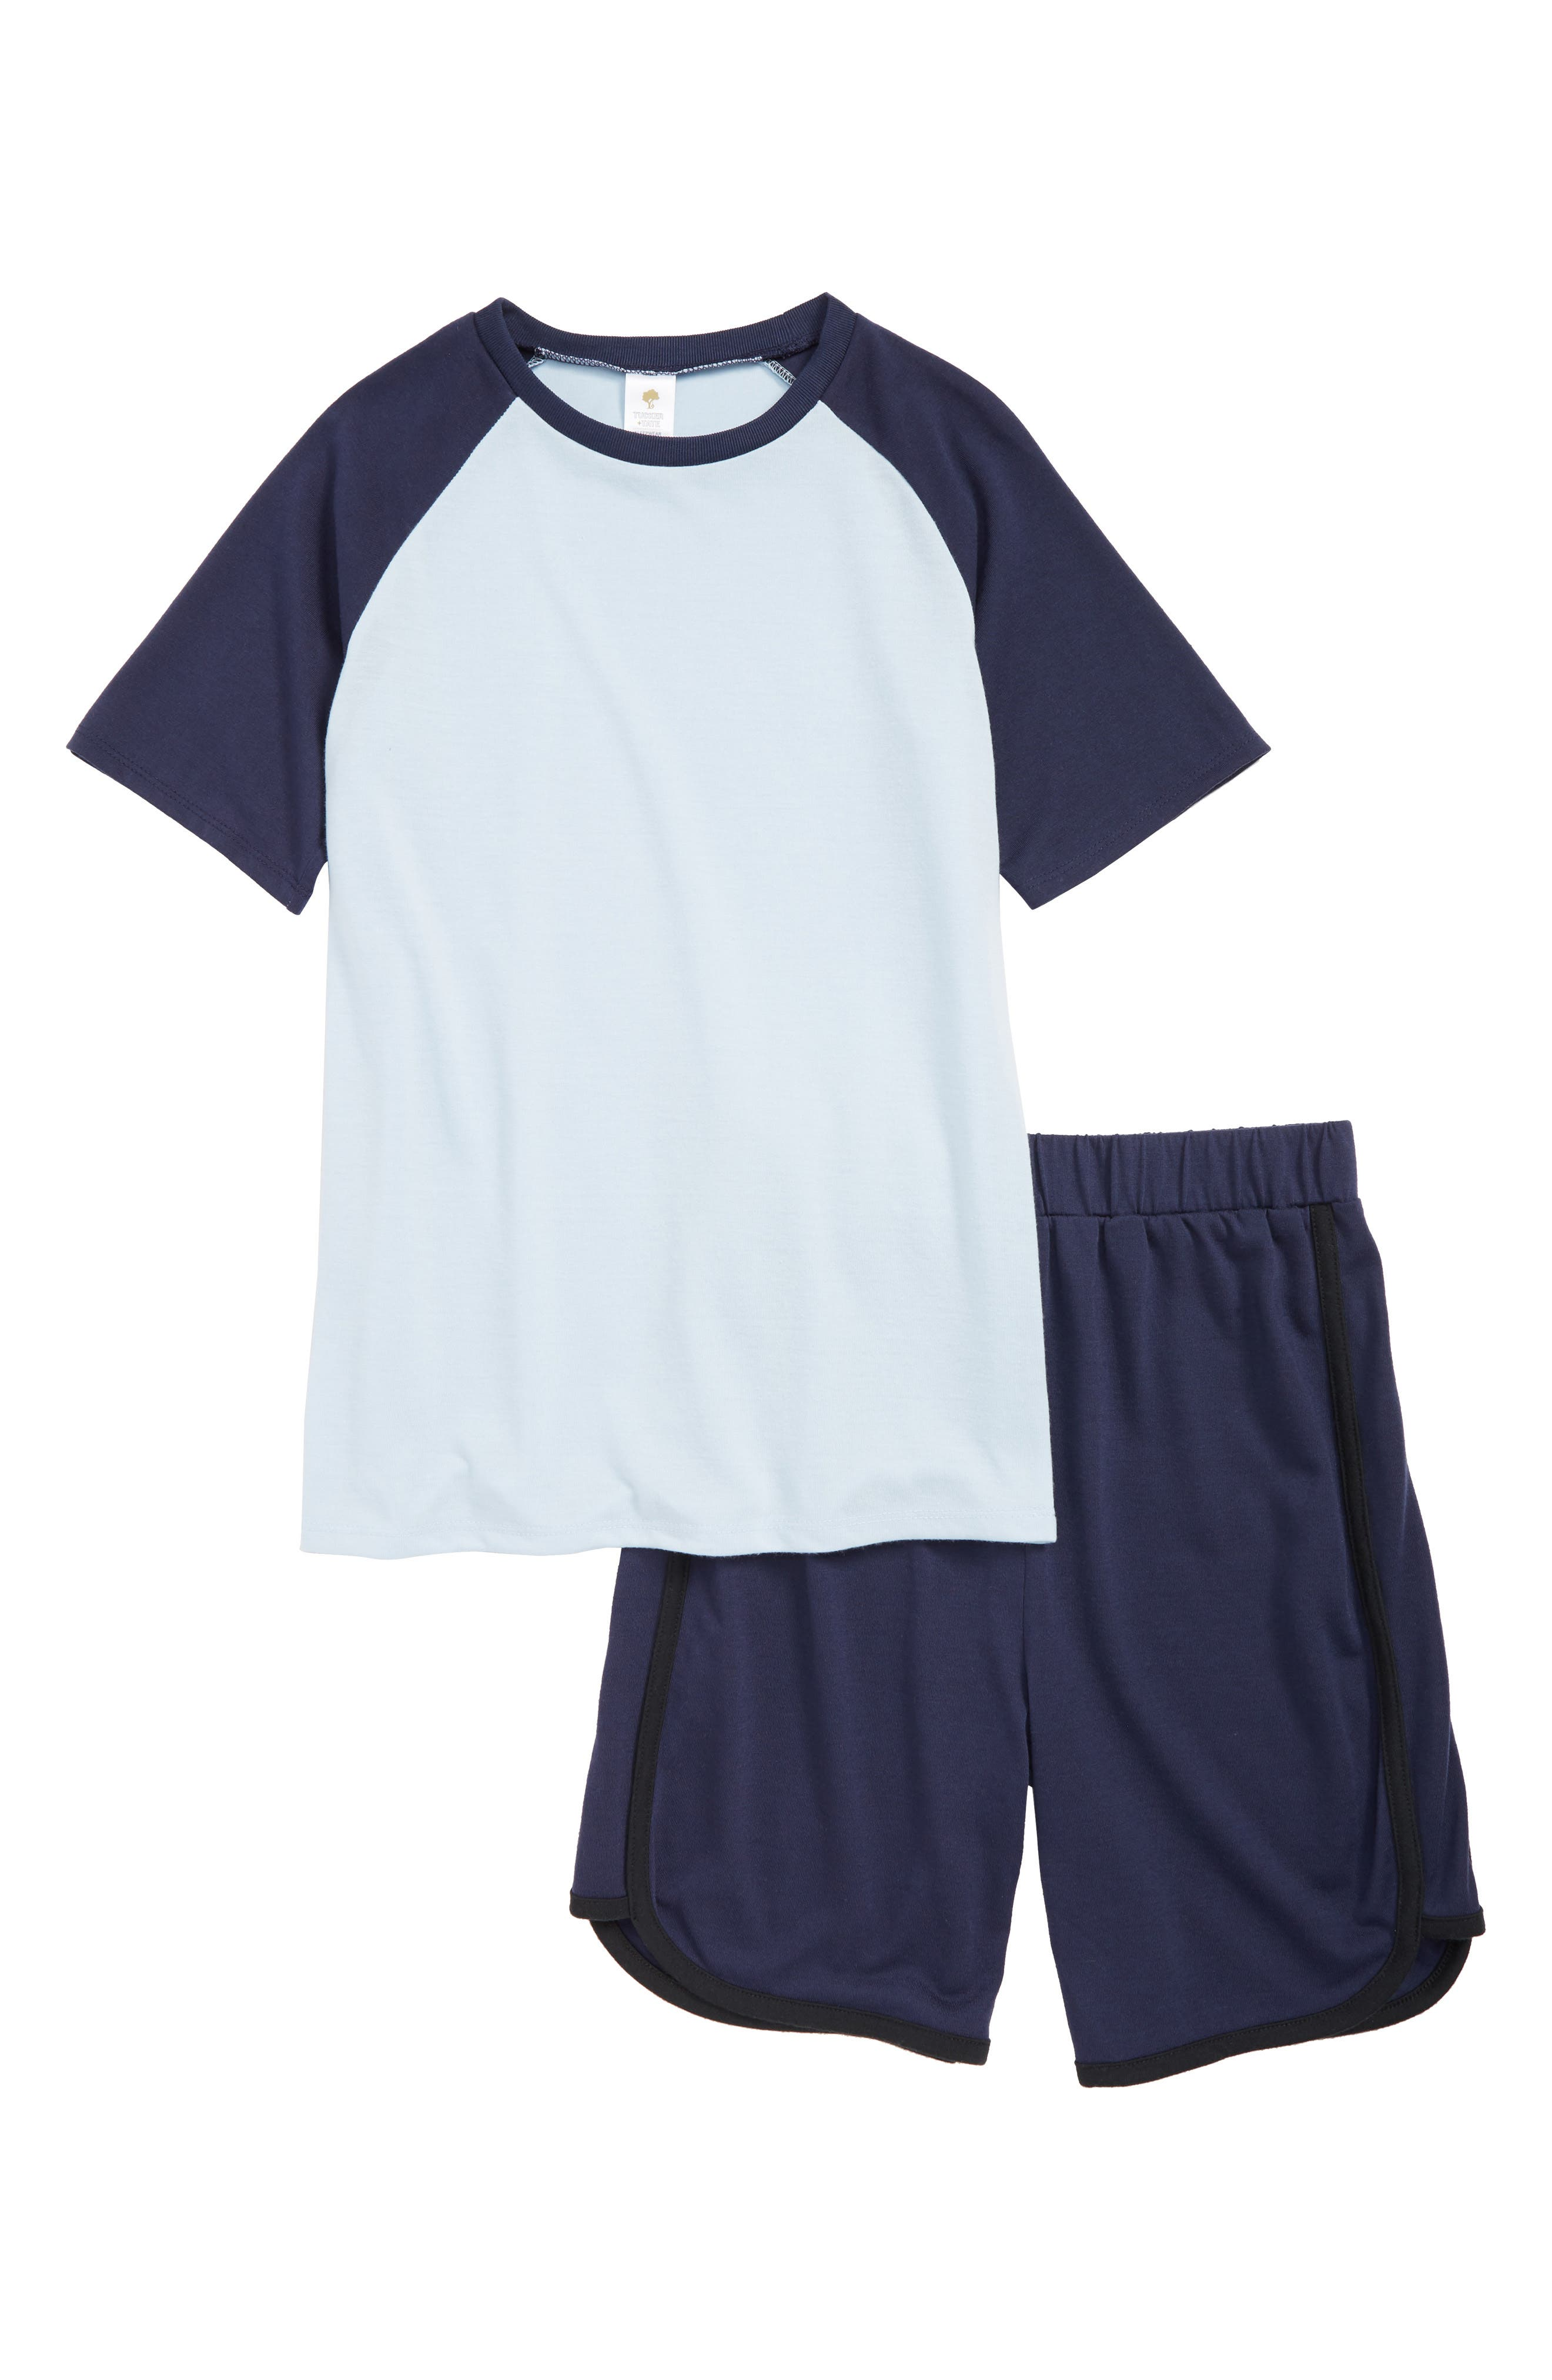 Boys Tucker  Tate Sporty Top  Shorts Set Size XXL (1820)  Red